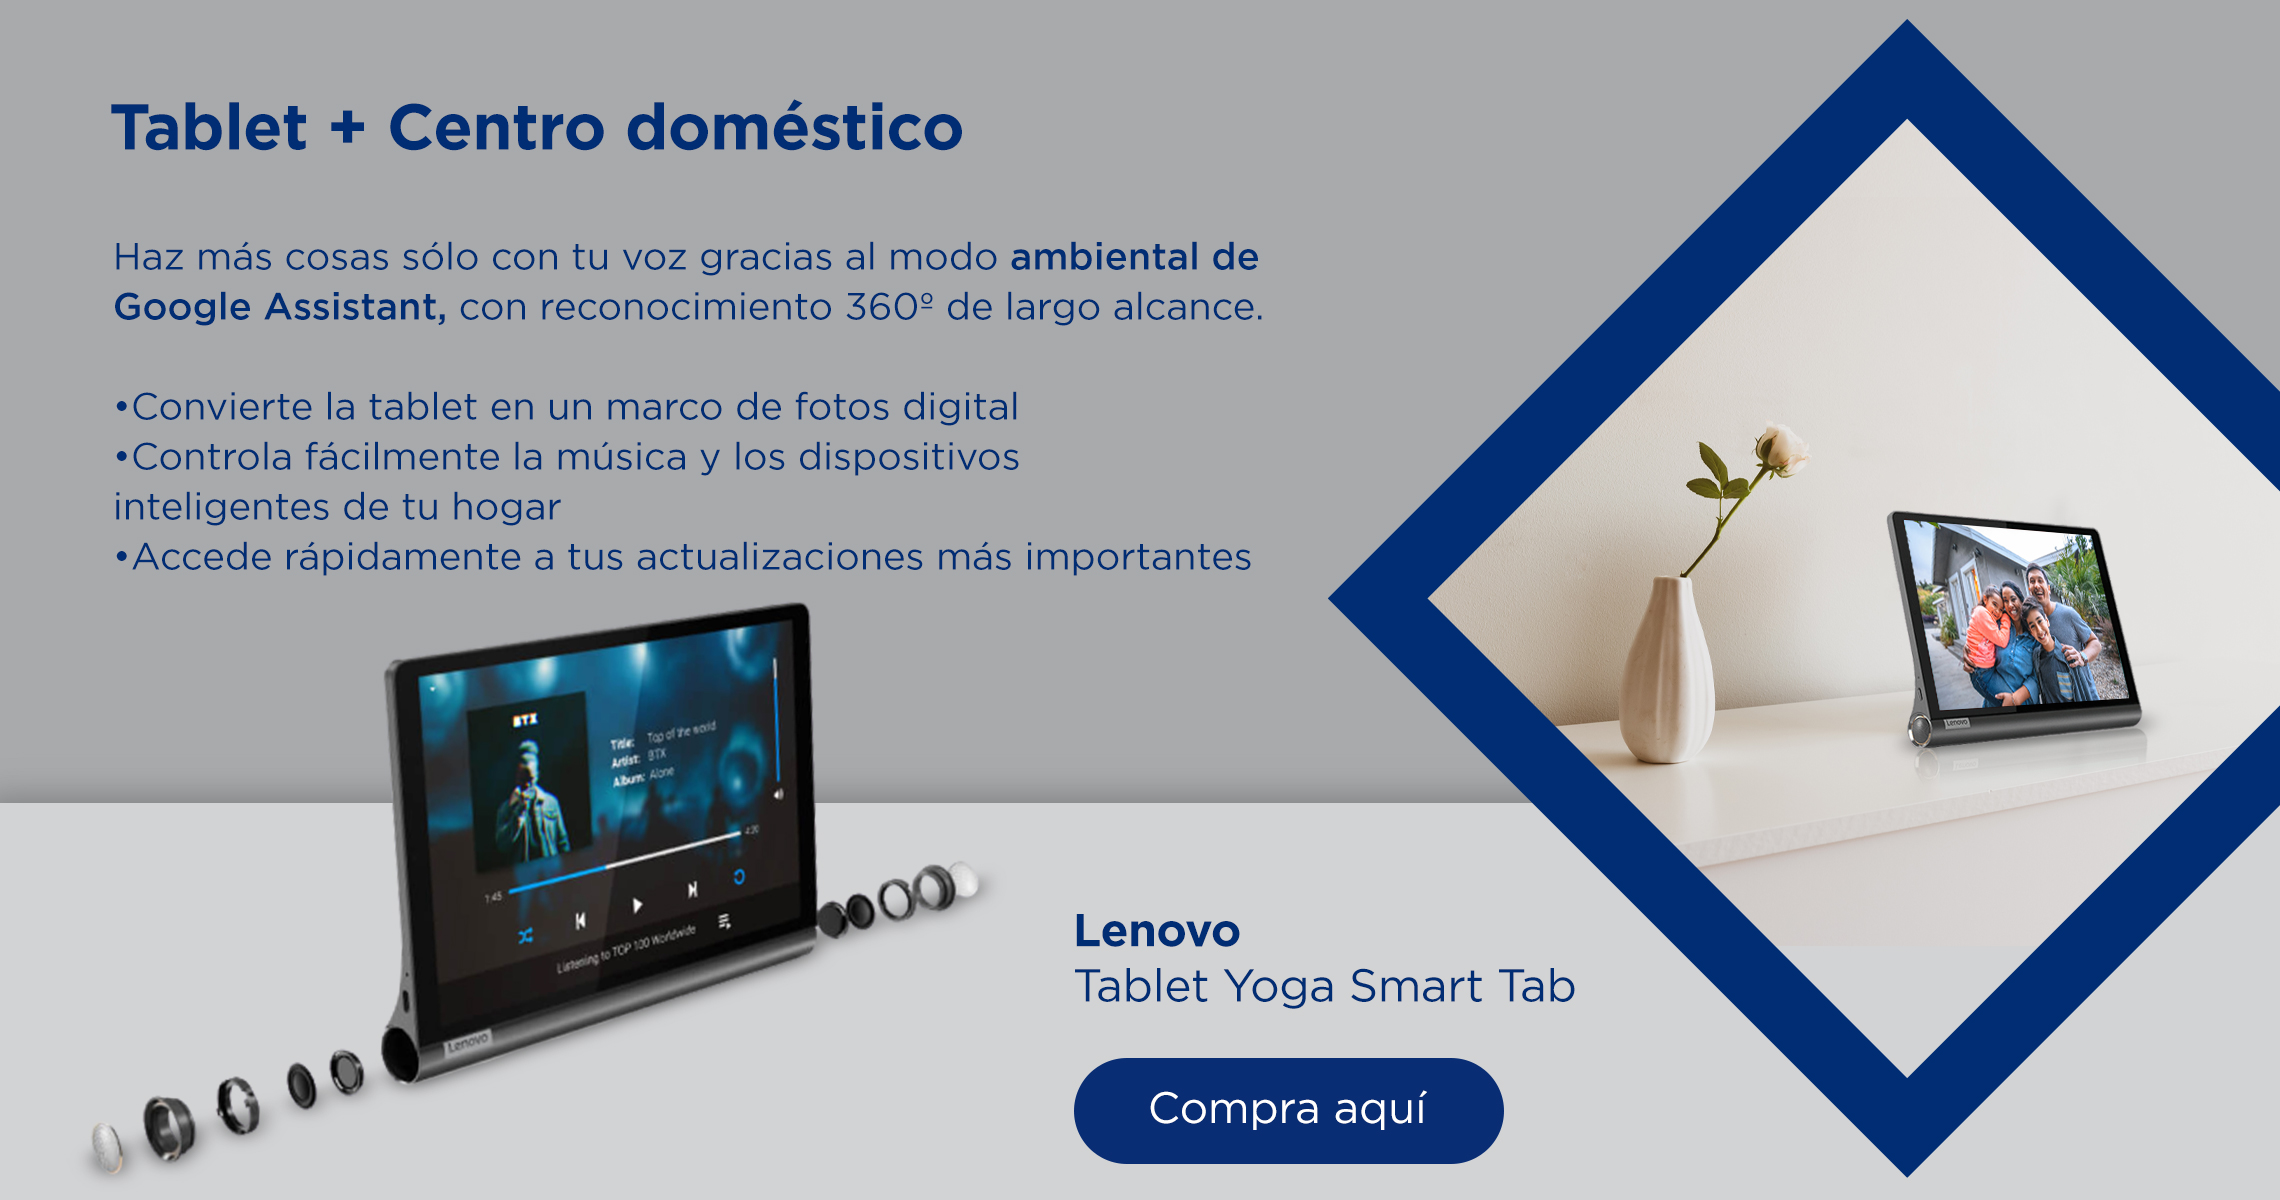 Lenovo Tablet Yoga Smart Tab